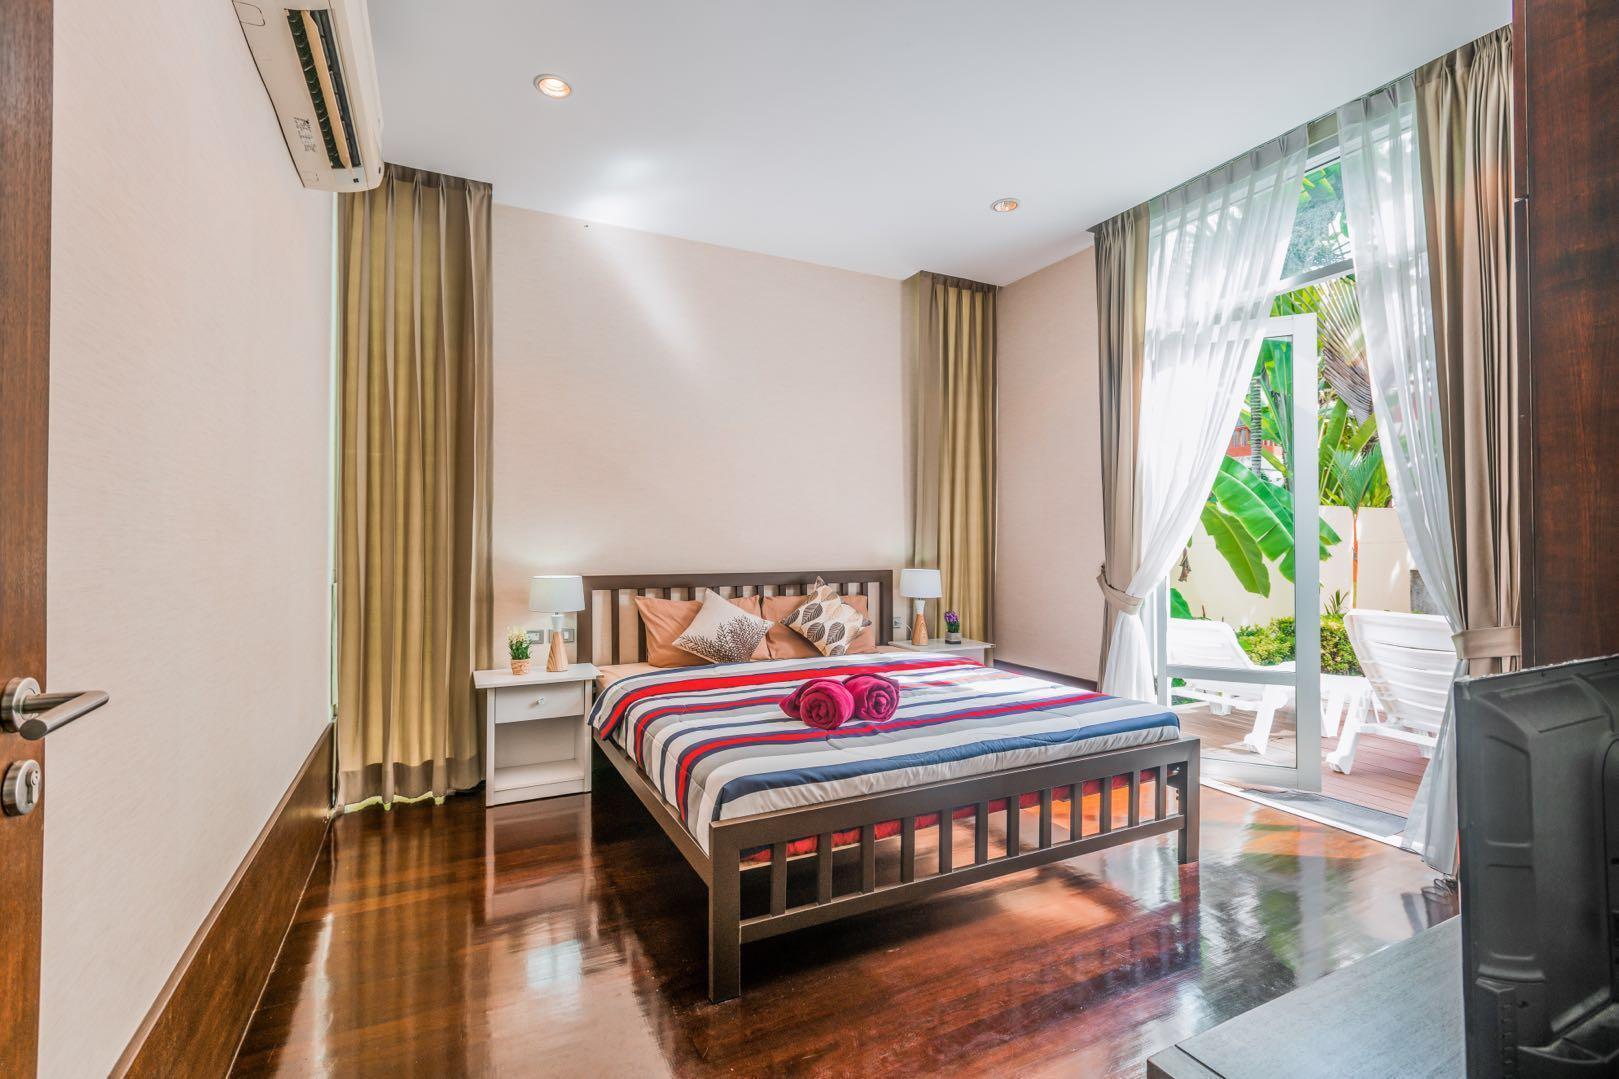 Nagawari 4 bedroom pool villa close to beach วิลลา 4 ห้องนอน 4 ห้องน้ำส่วนตัว ขนาด 600 ตร.ม. – นาจอมเทียน